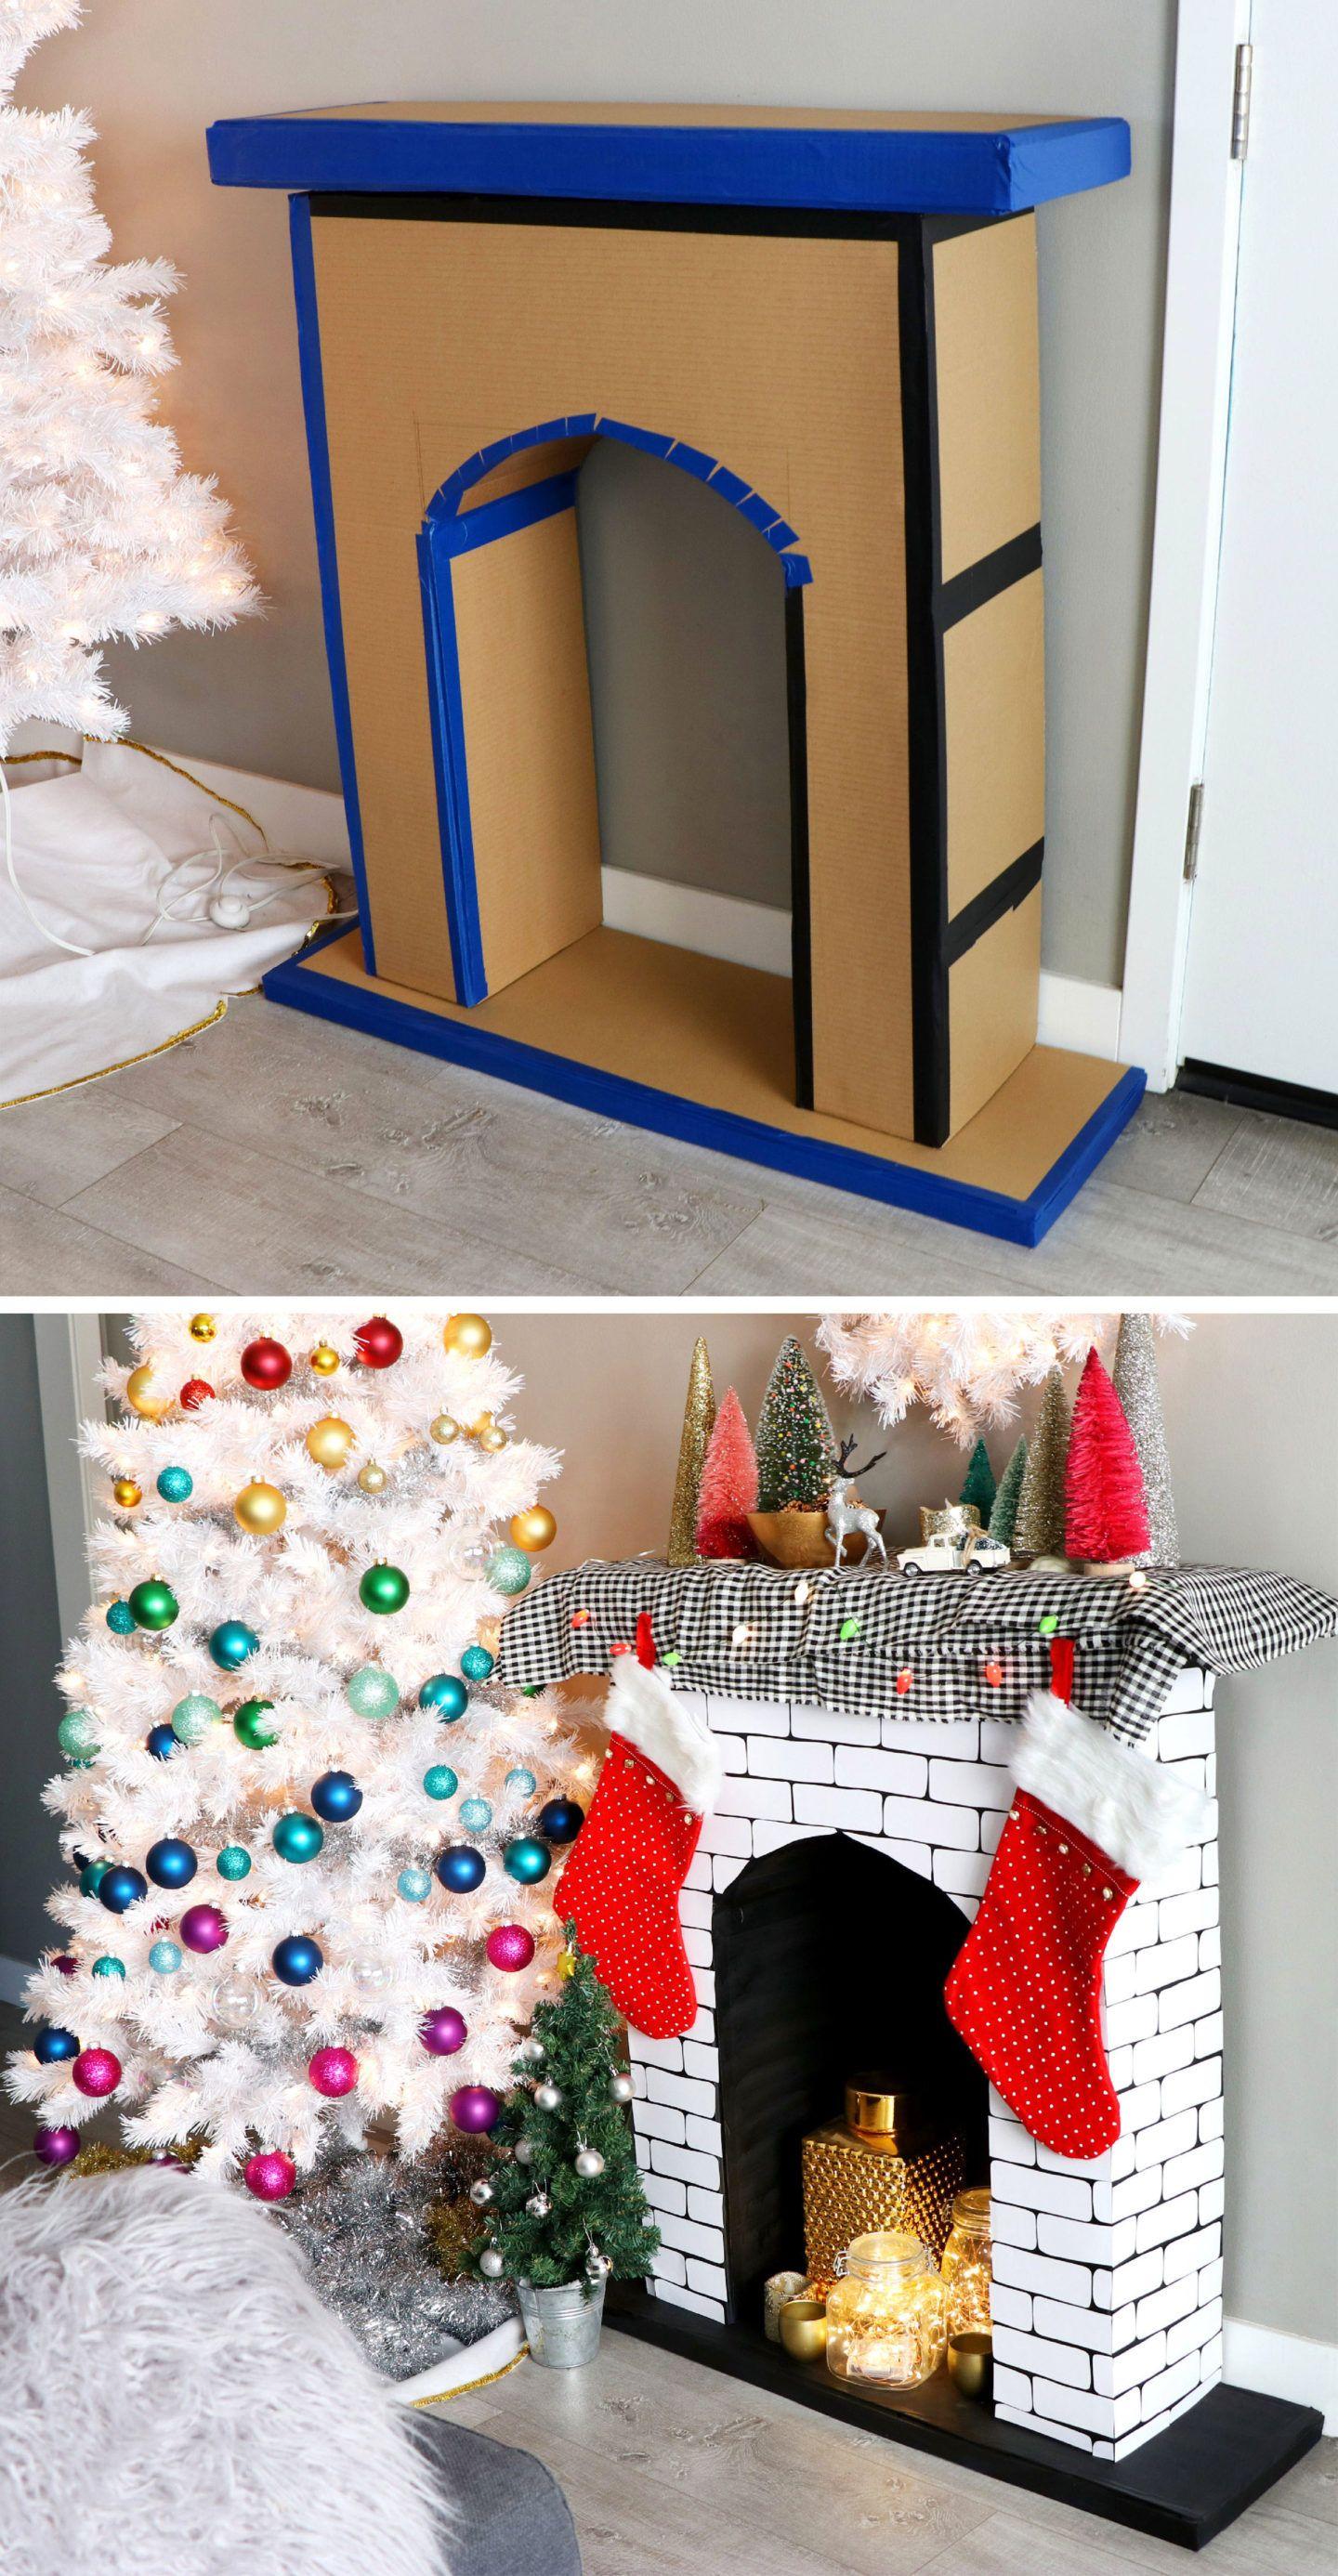 Diy Faux Cardboard Fireplace Christmas Decoration Karen Kavett Christmas Decor Diy Diy Christmas Fireplace Christmas Diy